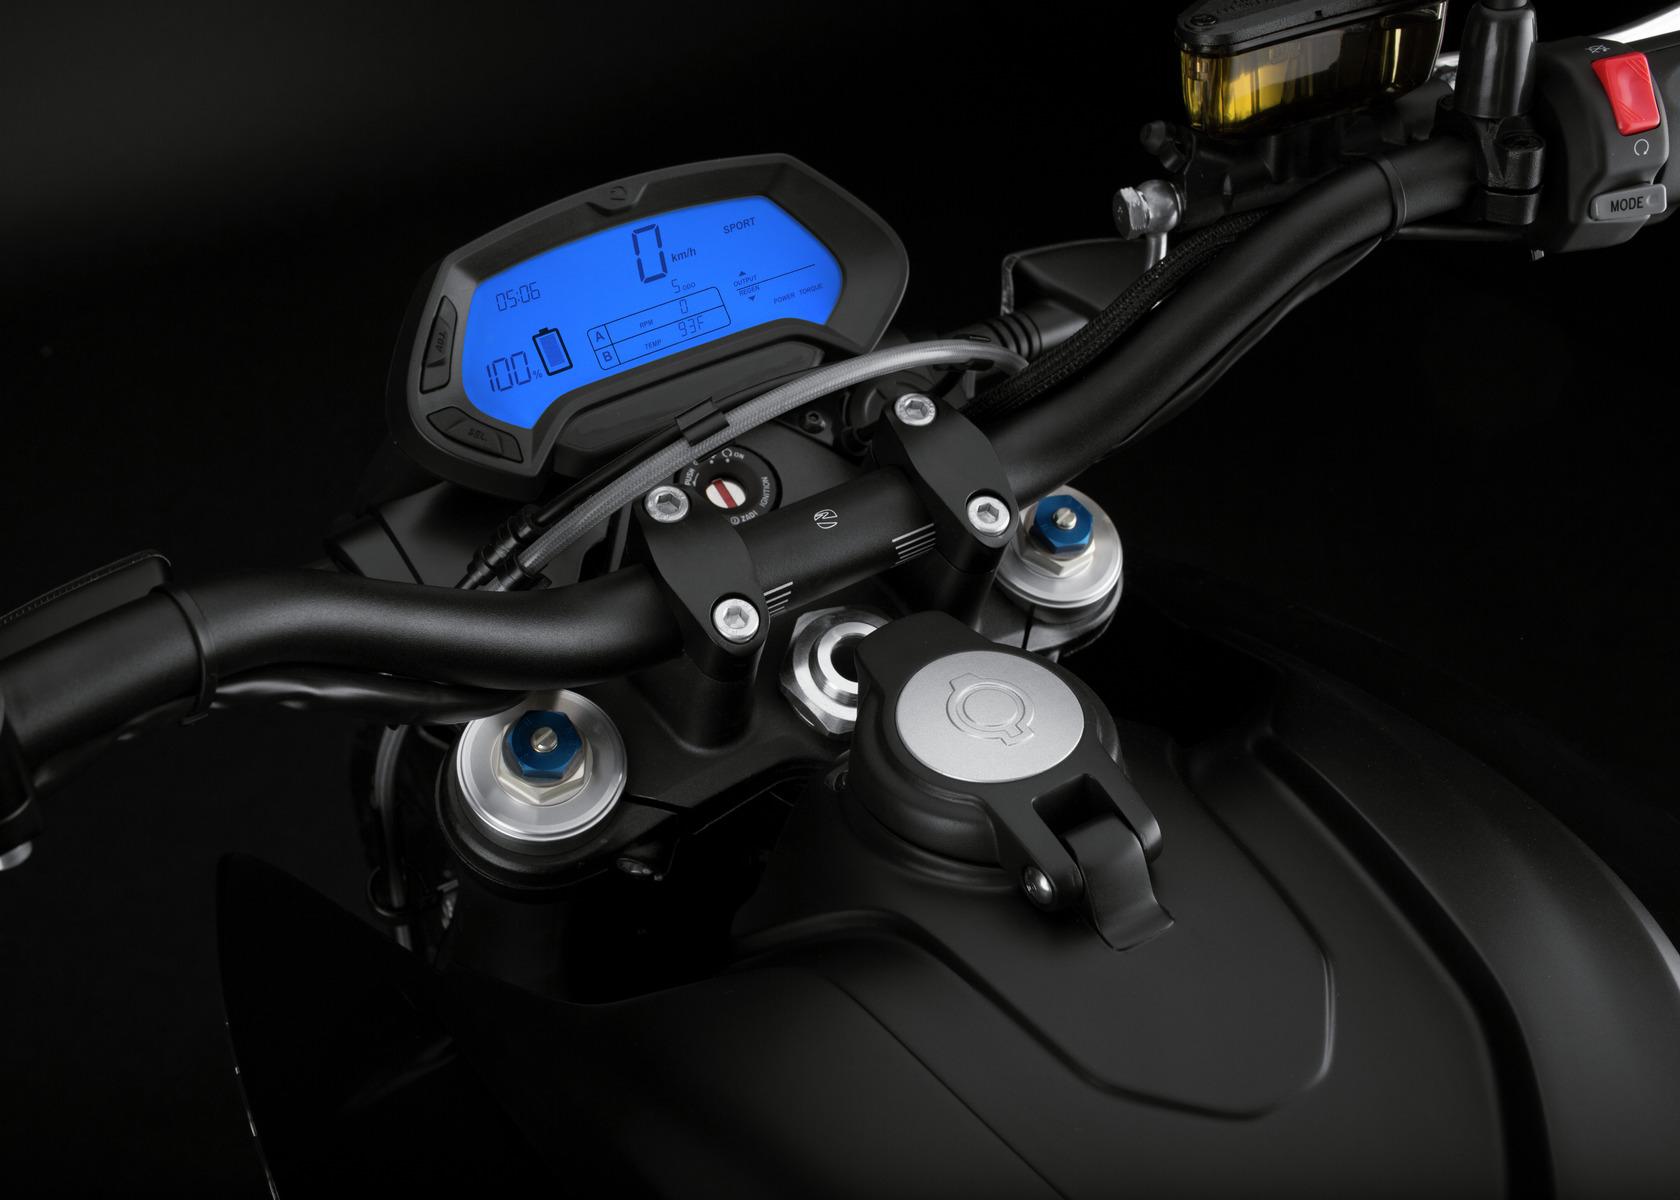 2016 Zero DSR Electric Motorcycle: Dashboard